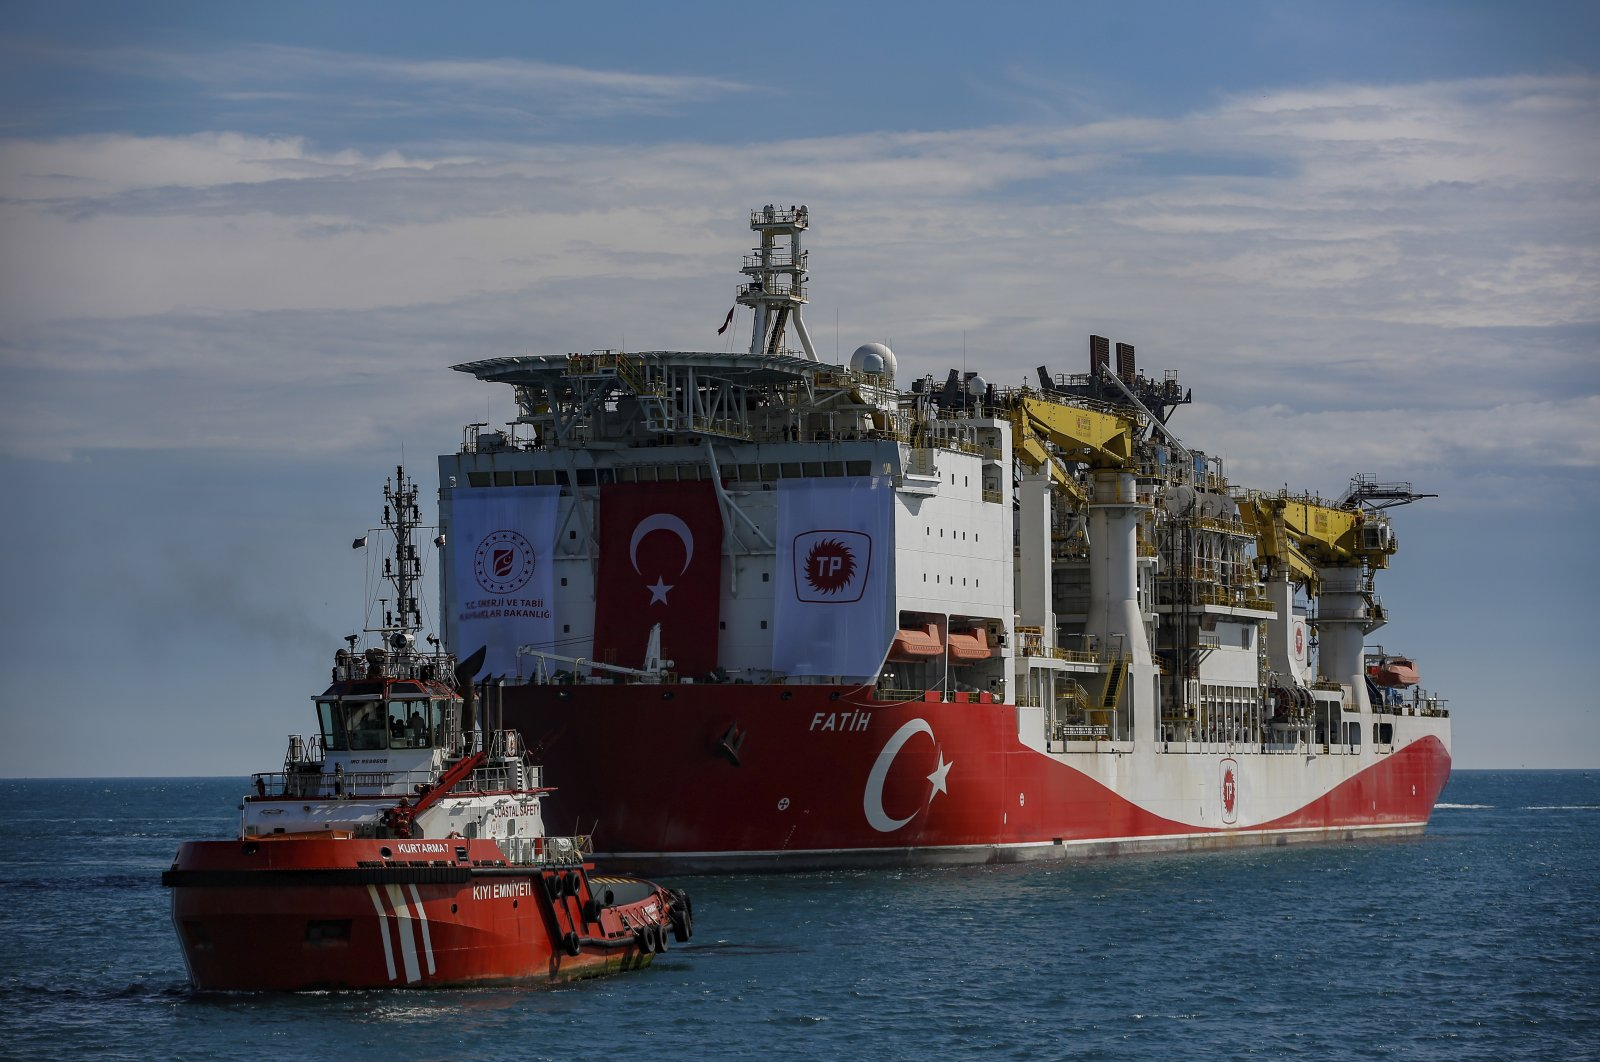 Turkey's drilling ship, the Fatih, sailing through the Bosphorus toward the Black Sea on May 29, 2020, Istanbul (AP Photo)